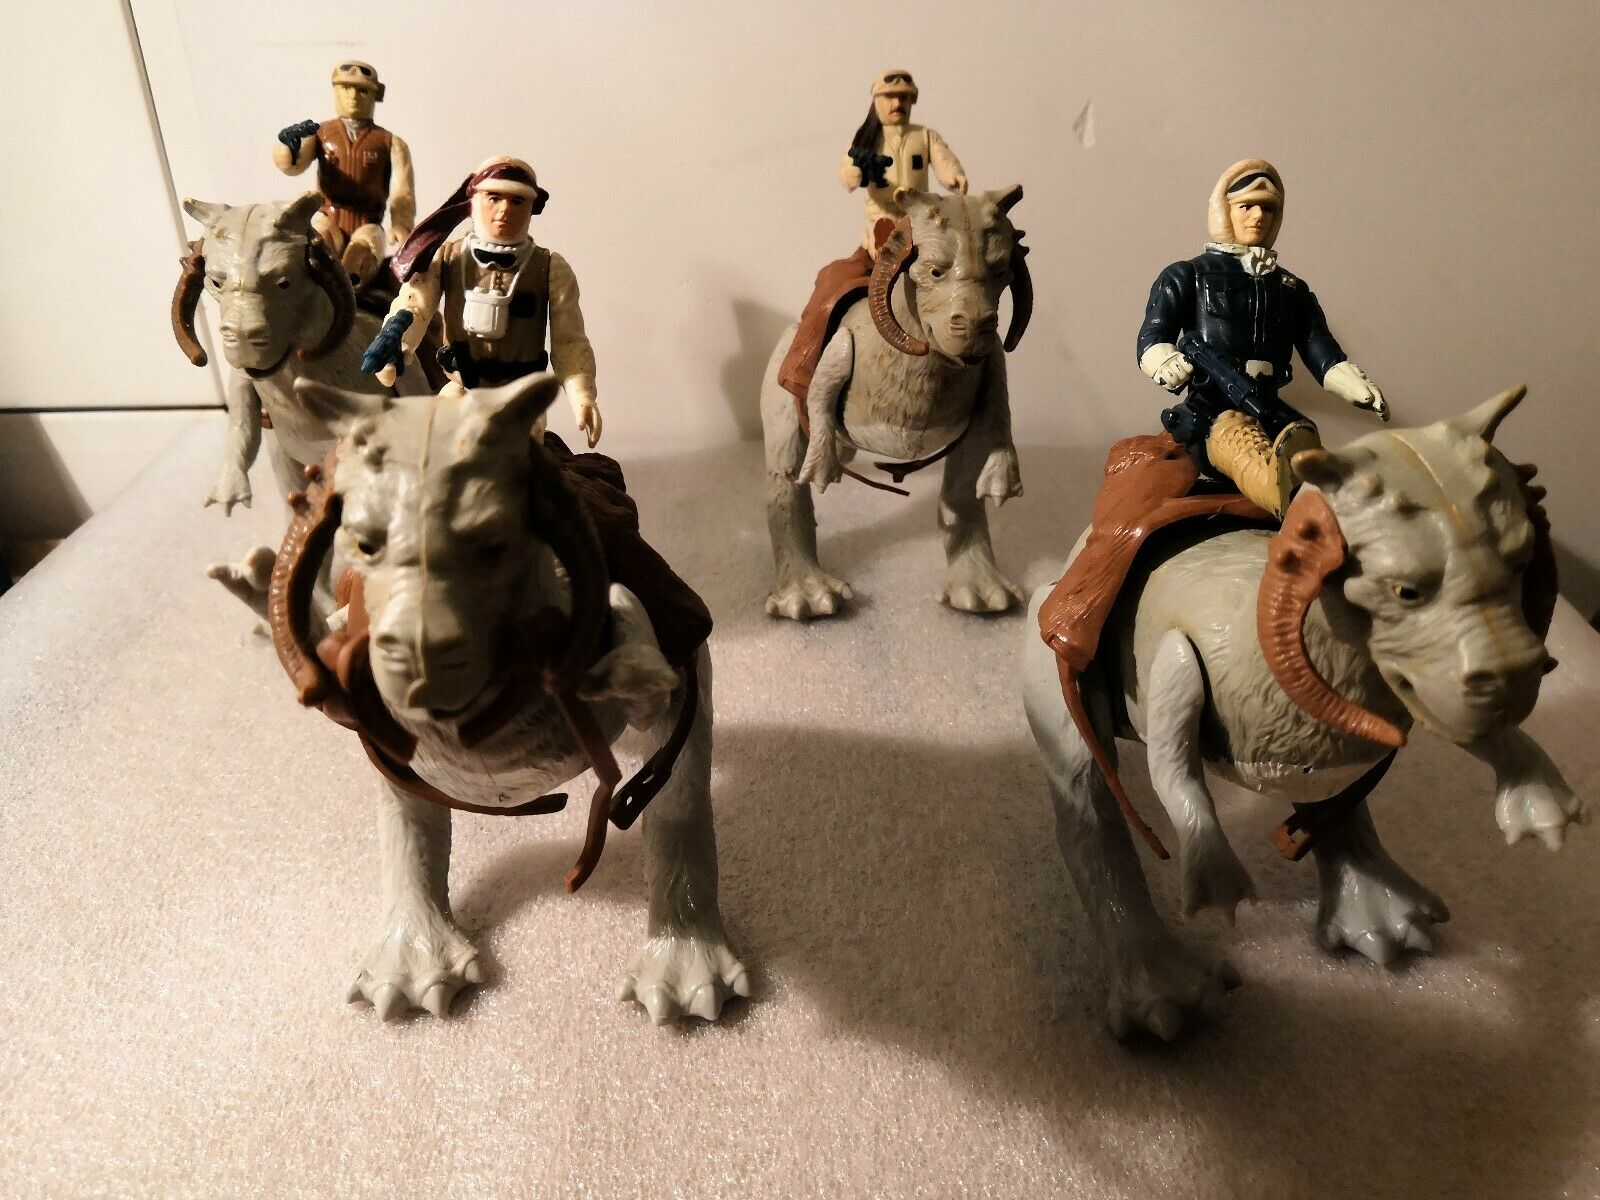 estrella guerras lot vintage tauntaun with accesories 4 cifras 4 accesories 4 tauntaun